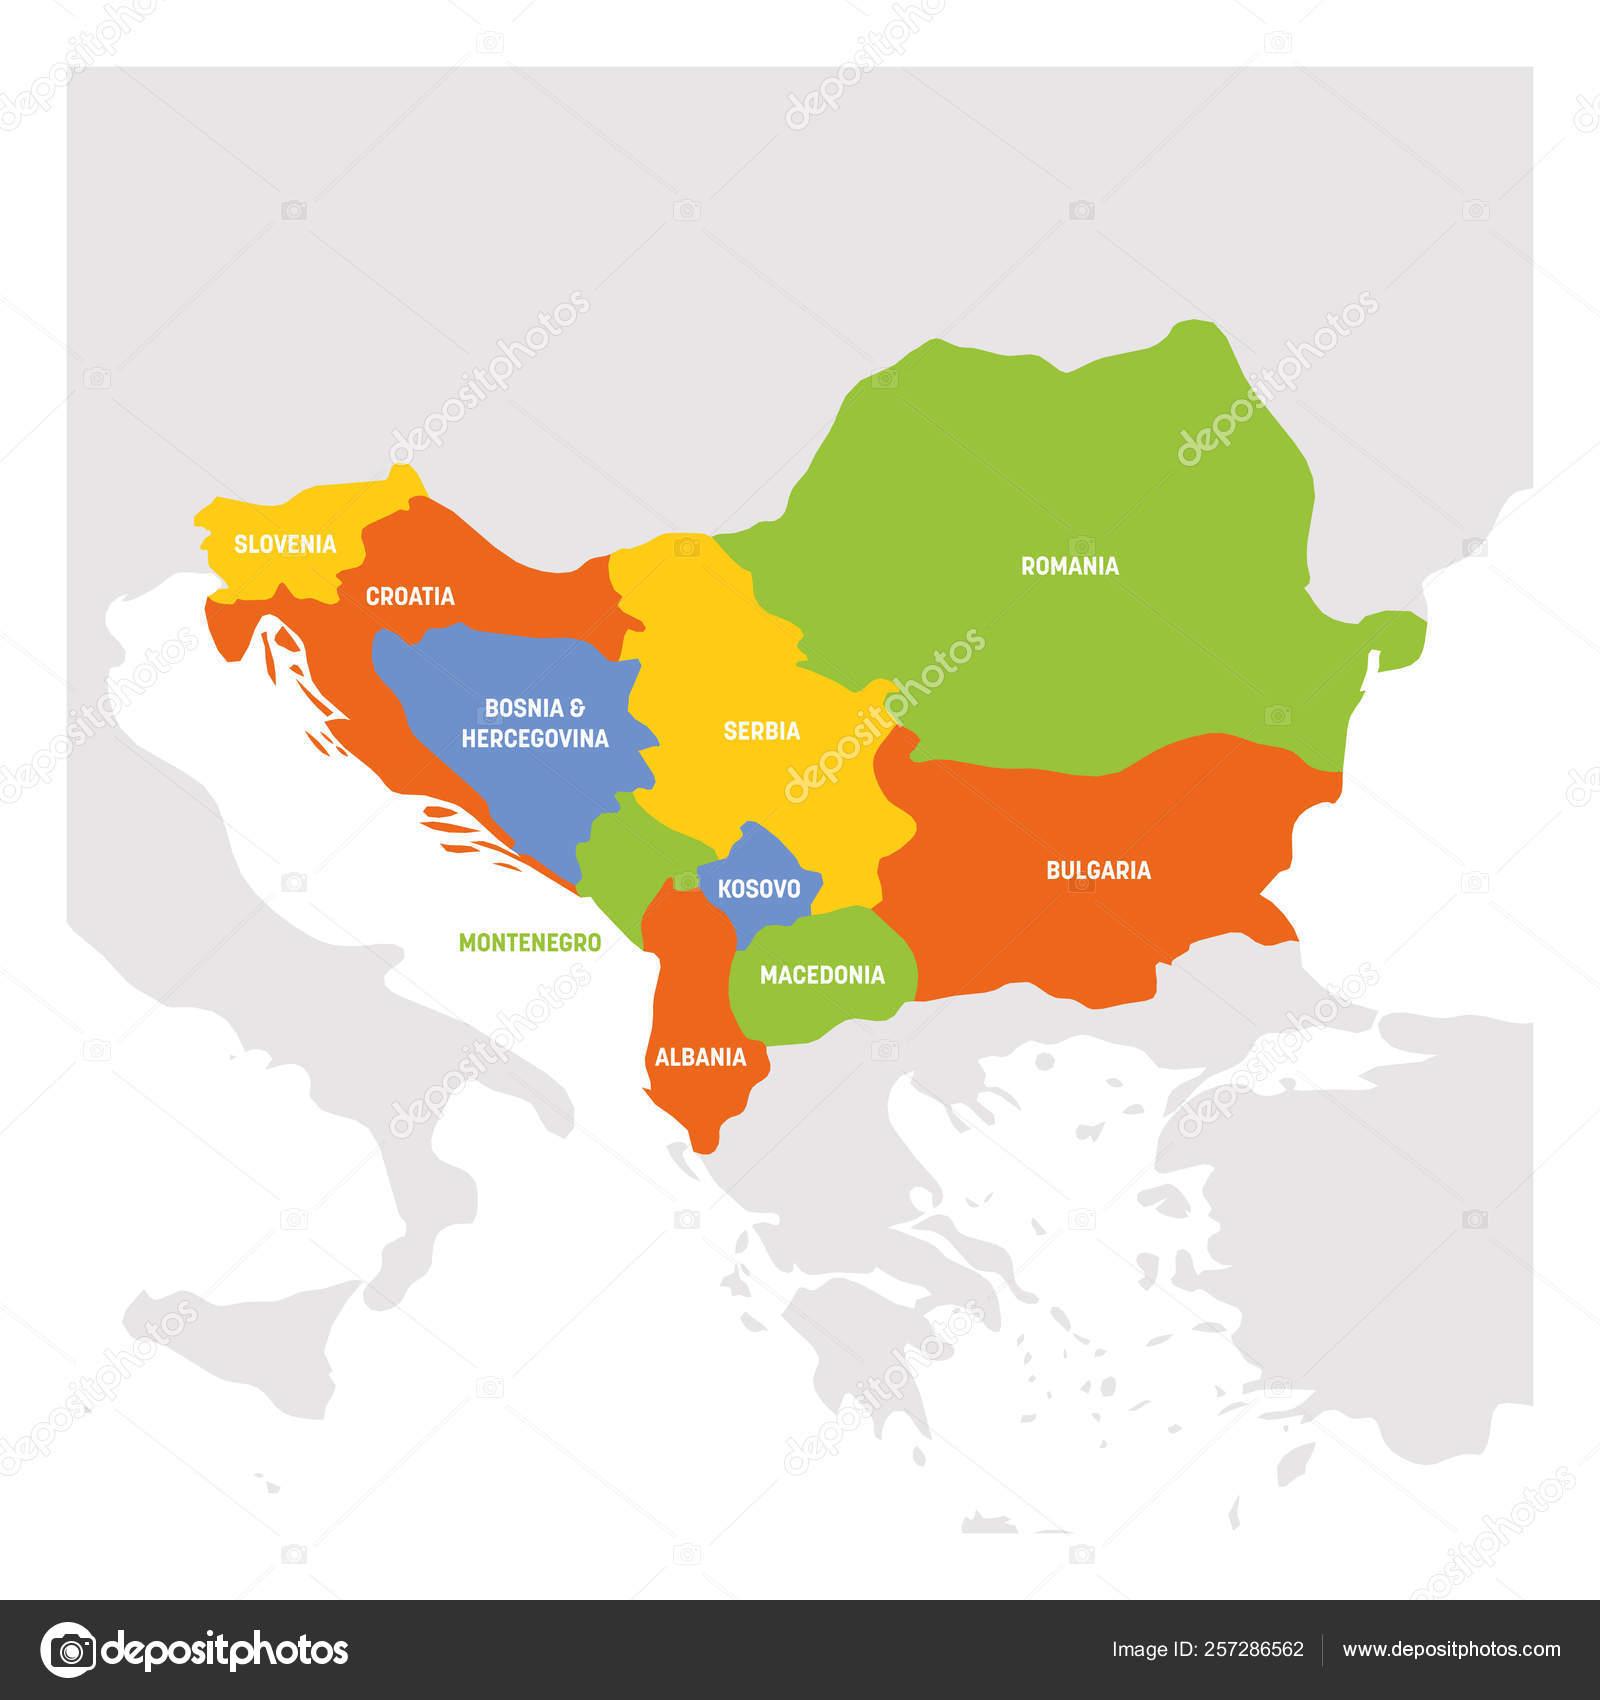 Southeast Europe Region Map Of Countries Of Balkan Peninsula